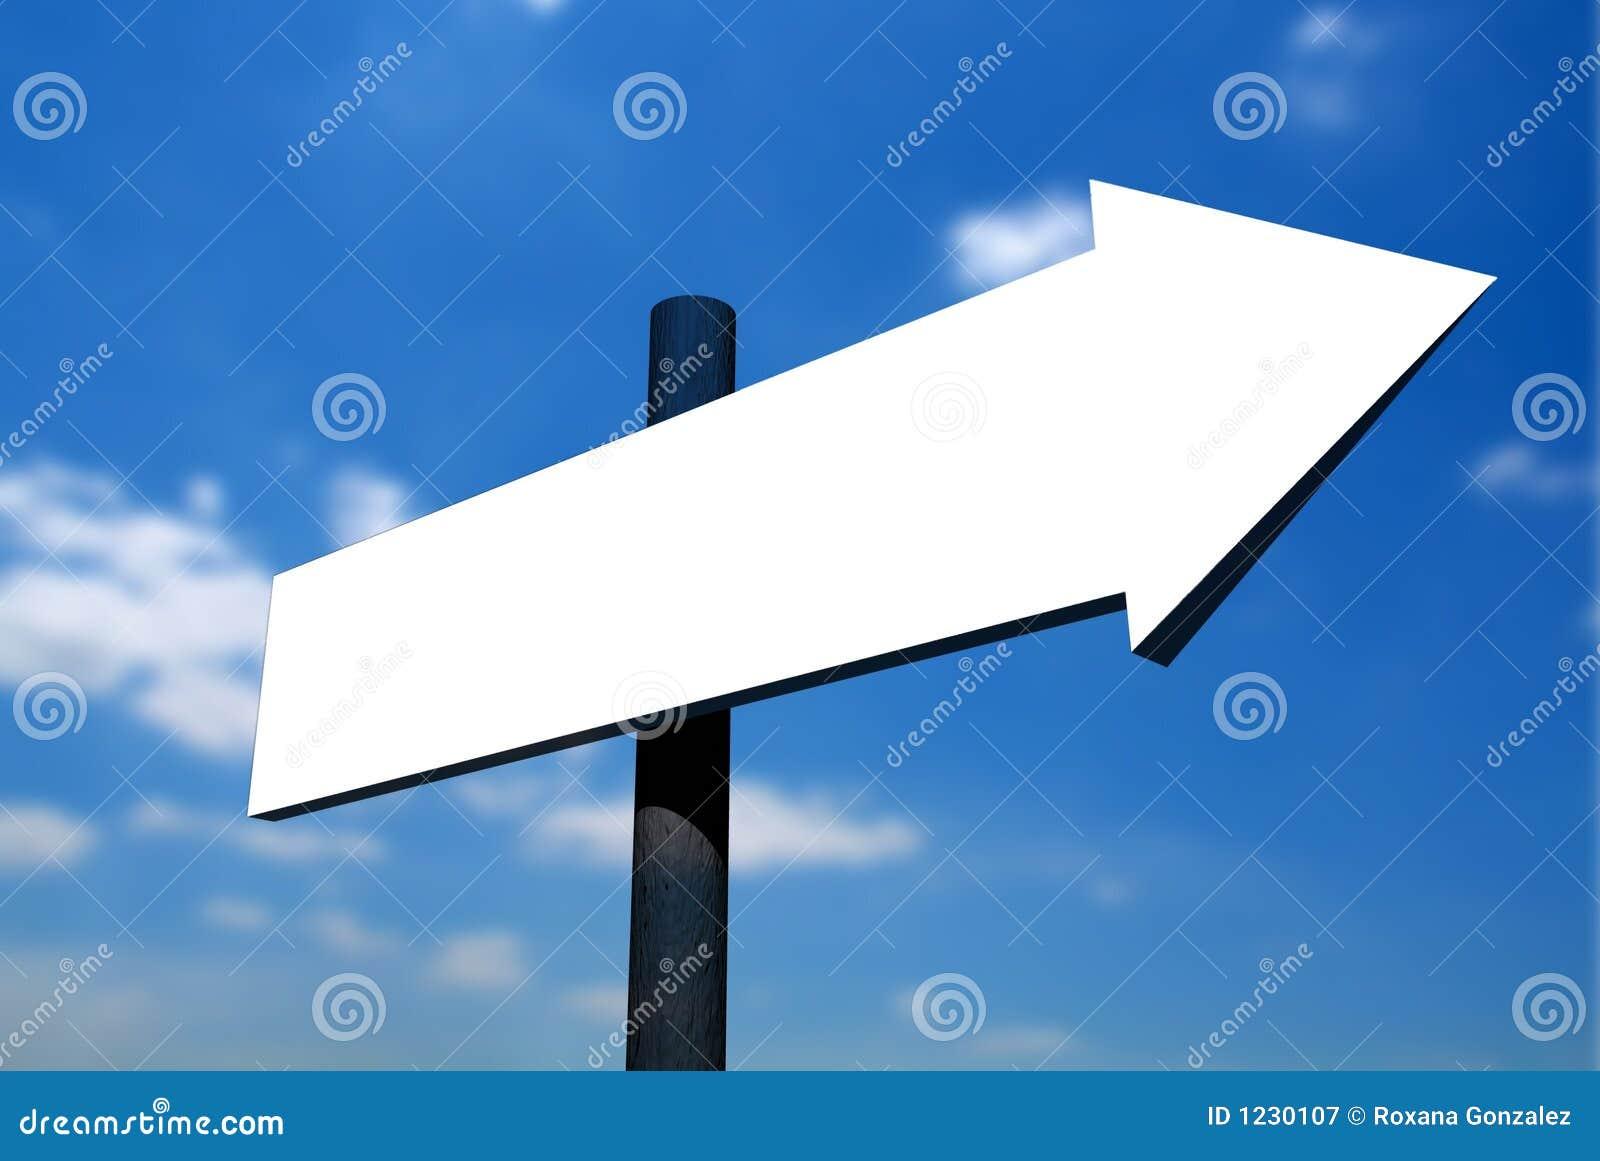 Blank Signpost Against Sky 2